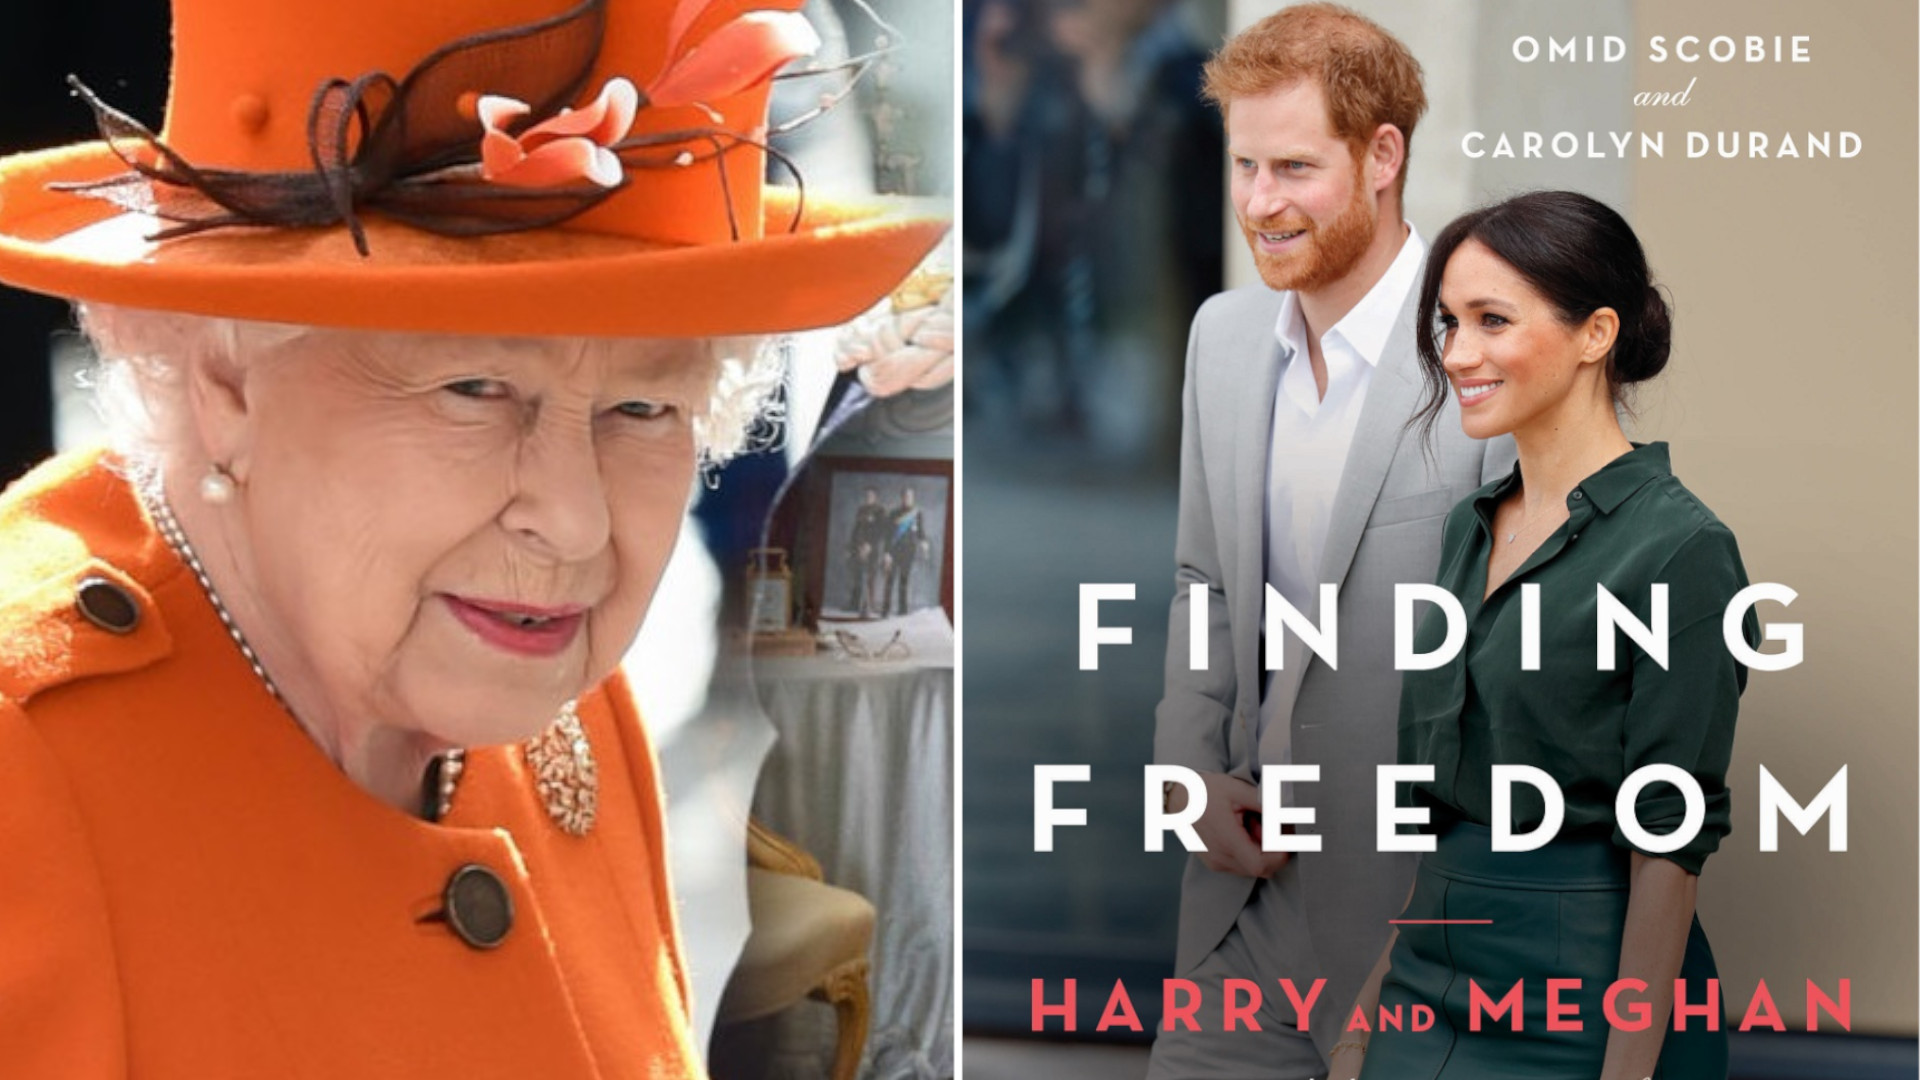 Pałac Buckingham już DRŻY na myśl o biografii Meghan i Harry'ego